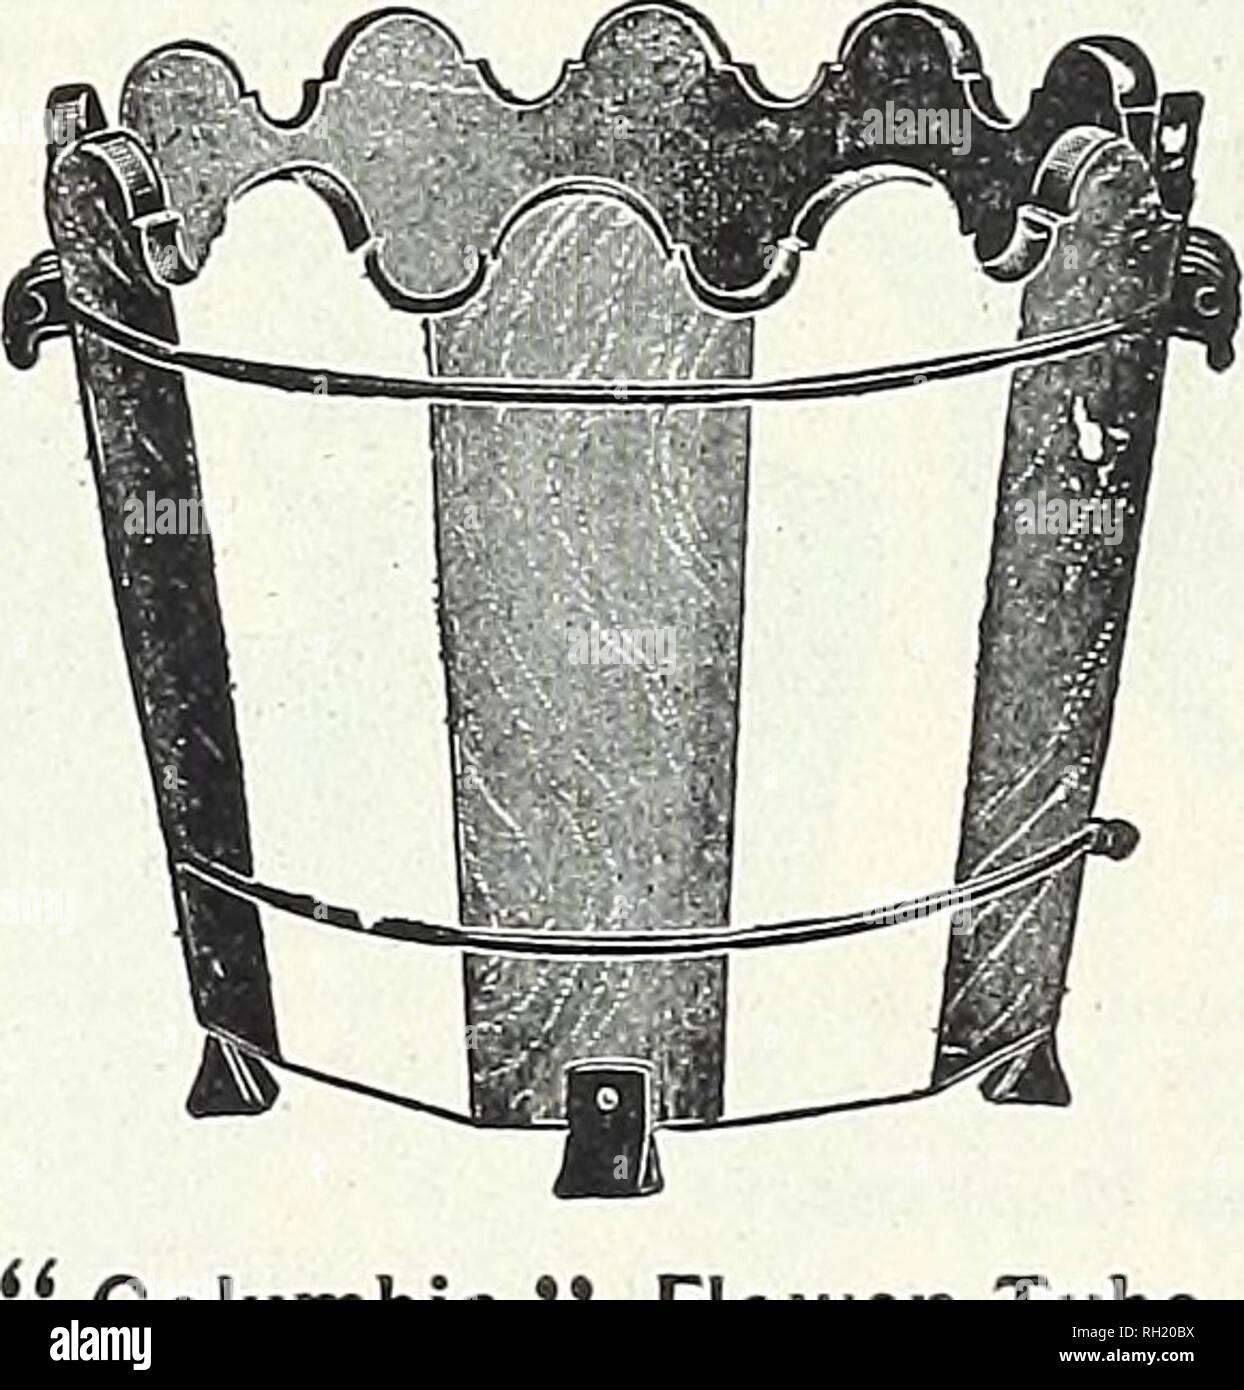 Poster oder Leinwand Bild T Kowak Pflanzen Topfpflanze Malerei Creme C0ND